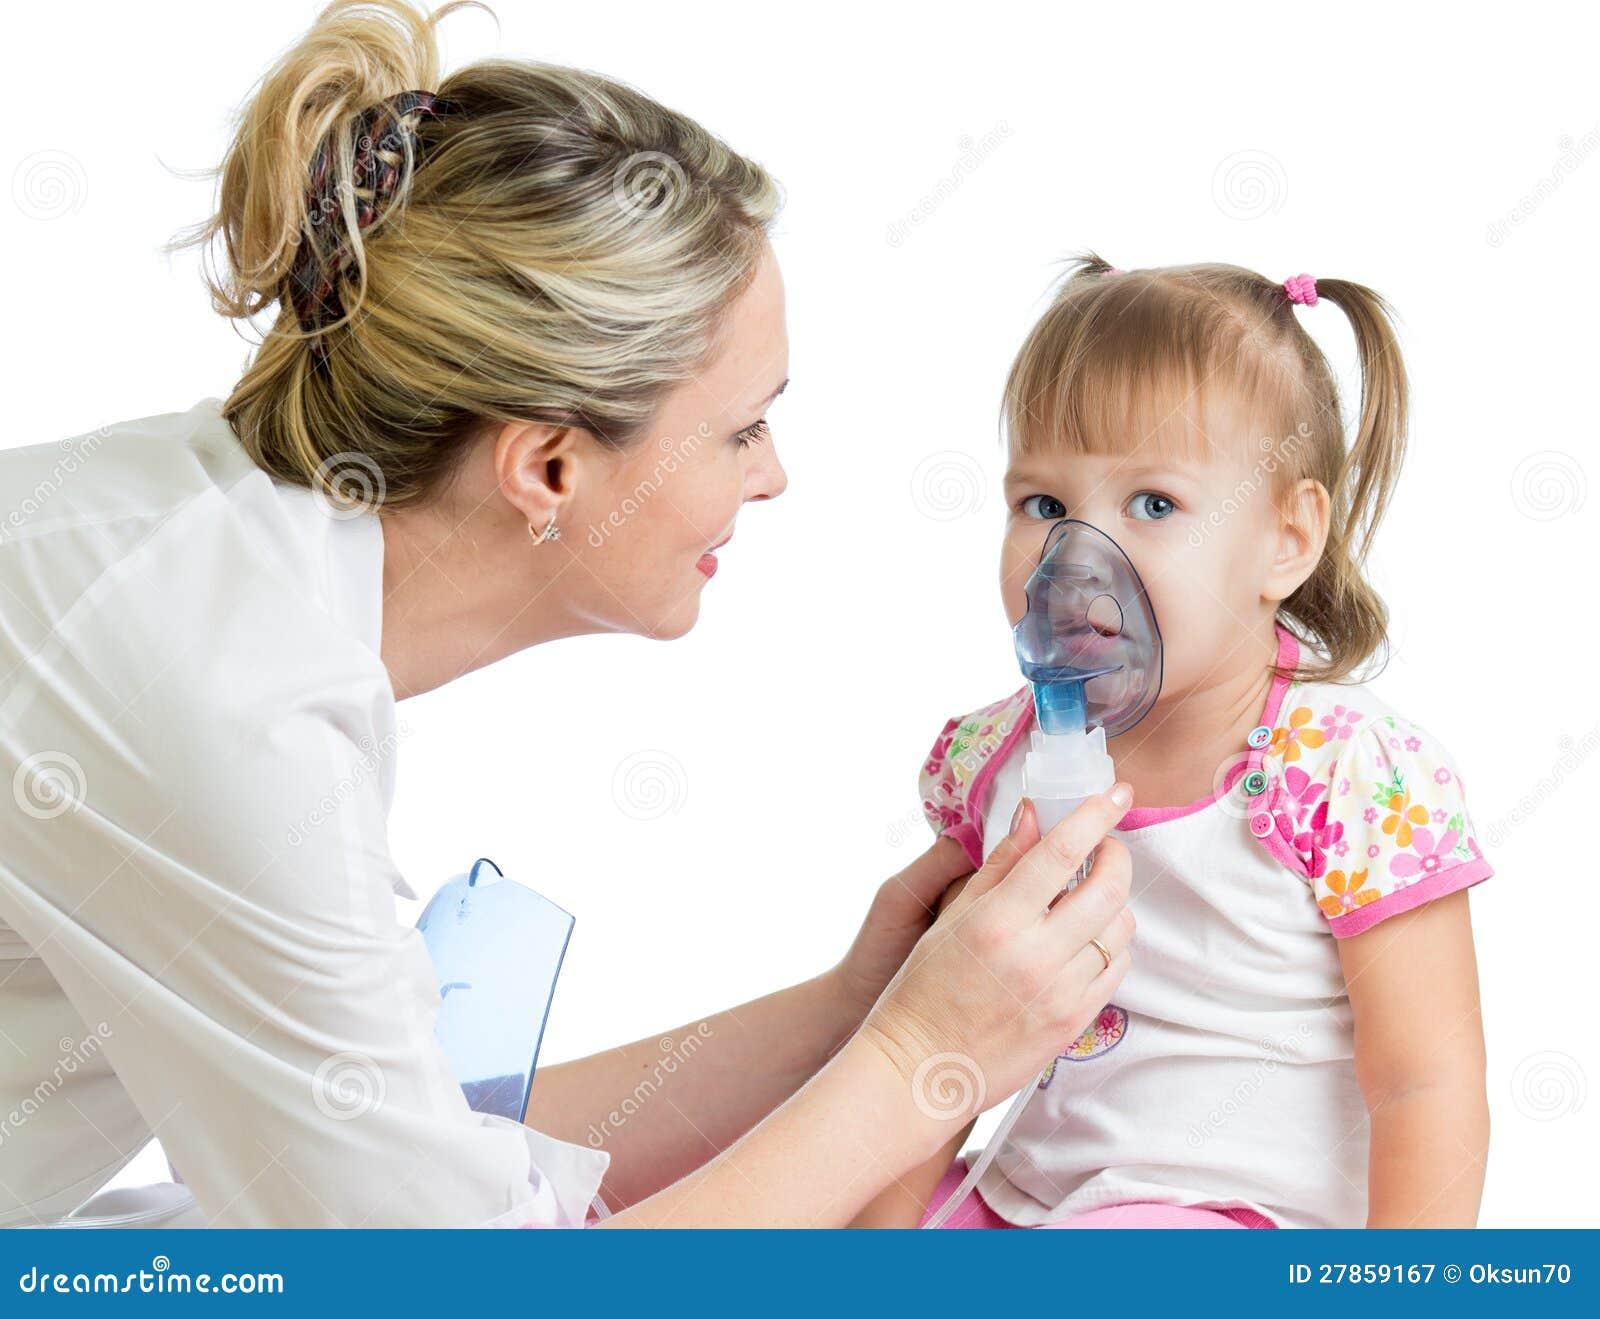 Doctor Holding Inhaler Mask For Kid Breathing Stock Image ...